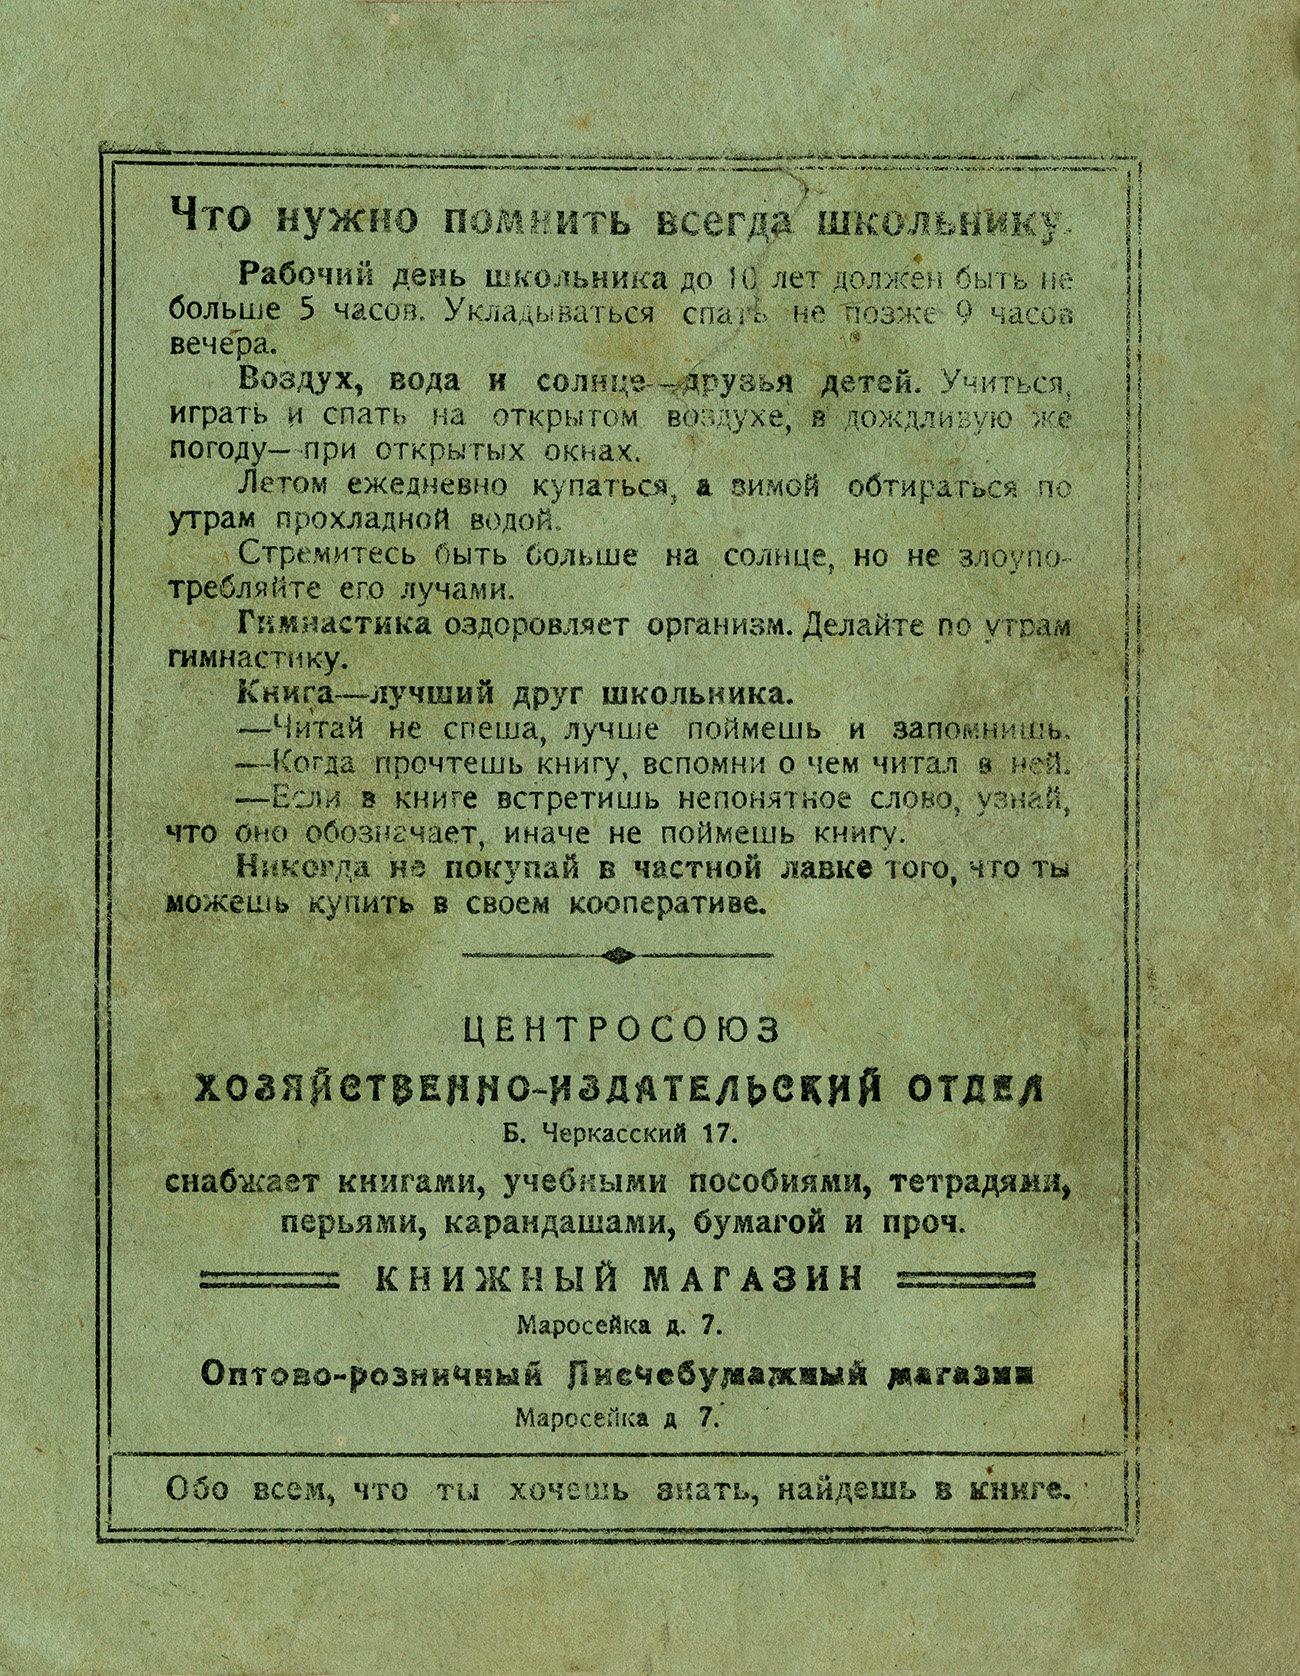 Тетрадь Калинин 1927 4